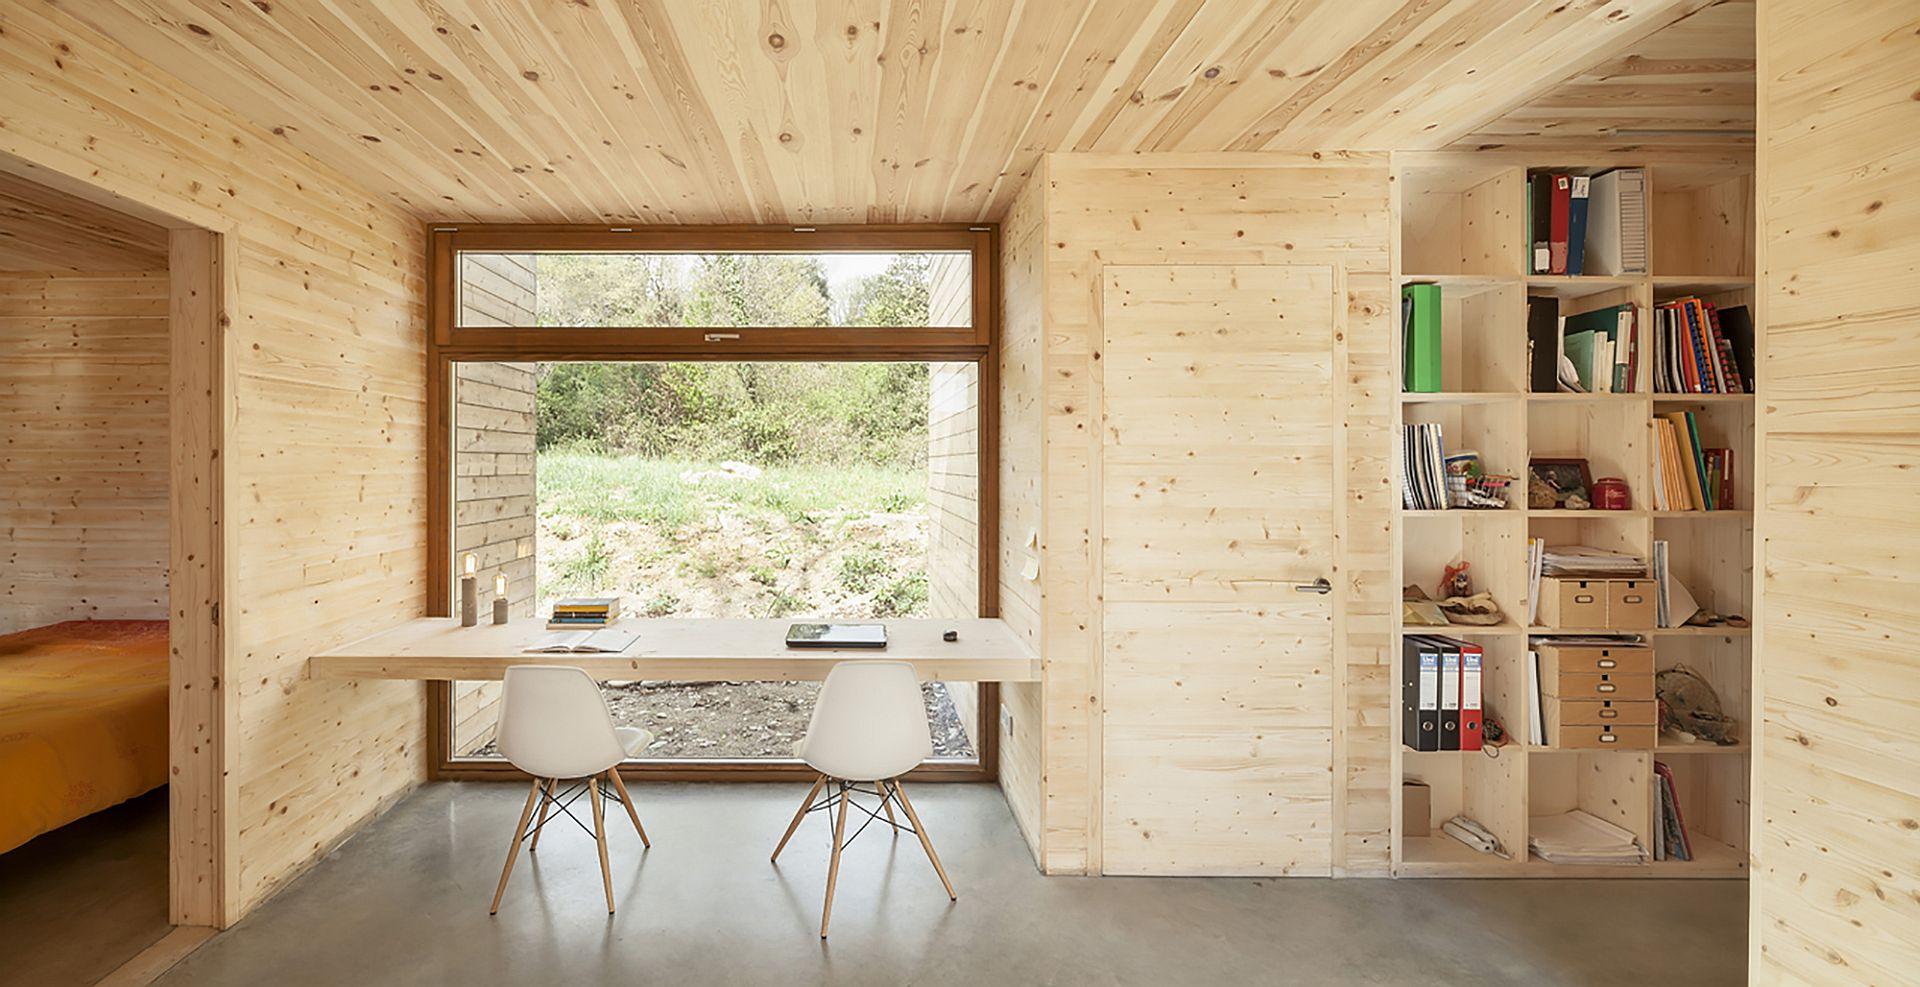 Gallery 6 prefab boxes make a passive house alventosa - Casas bioclimaticas prefabricadas ...